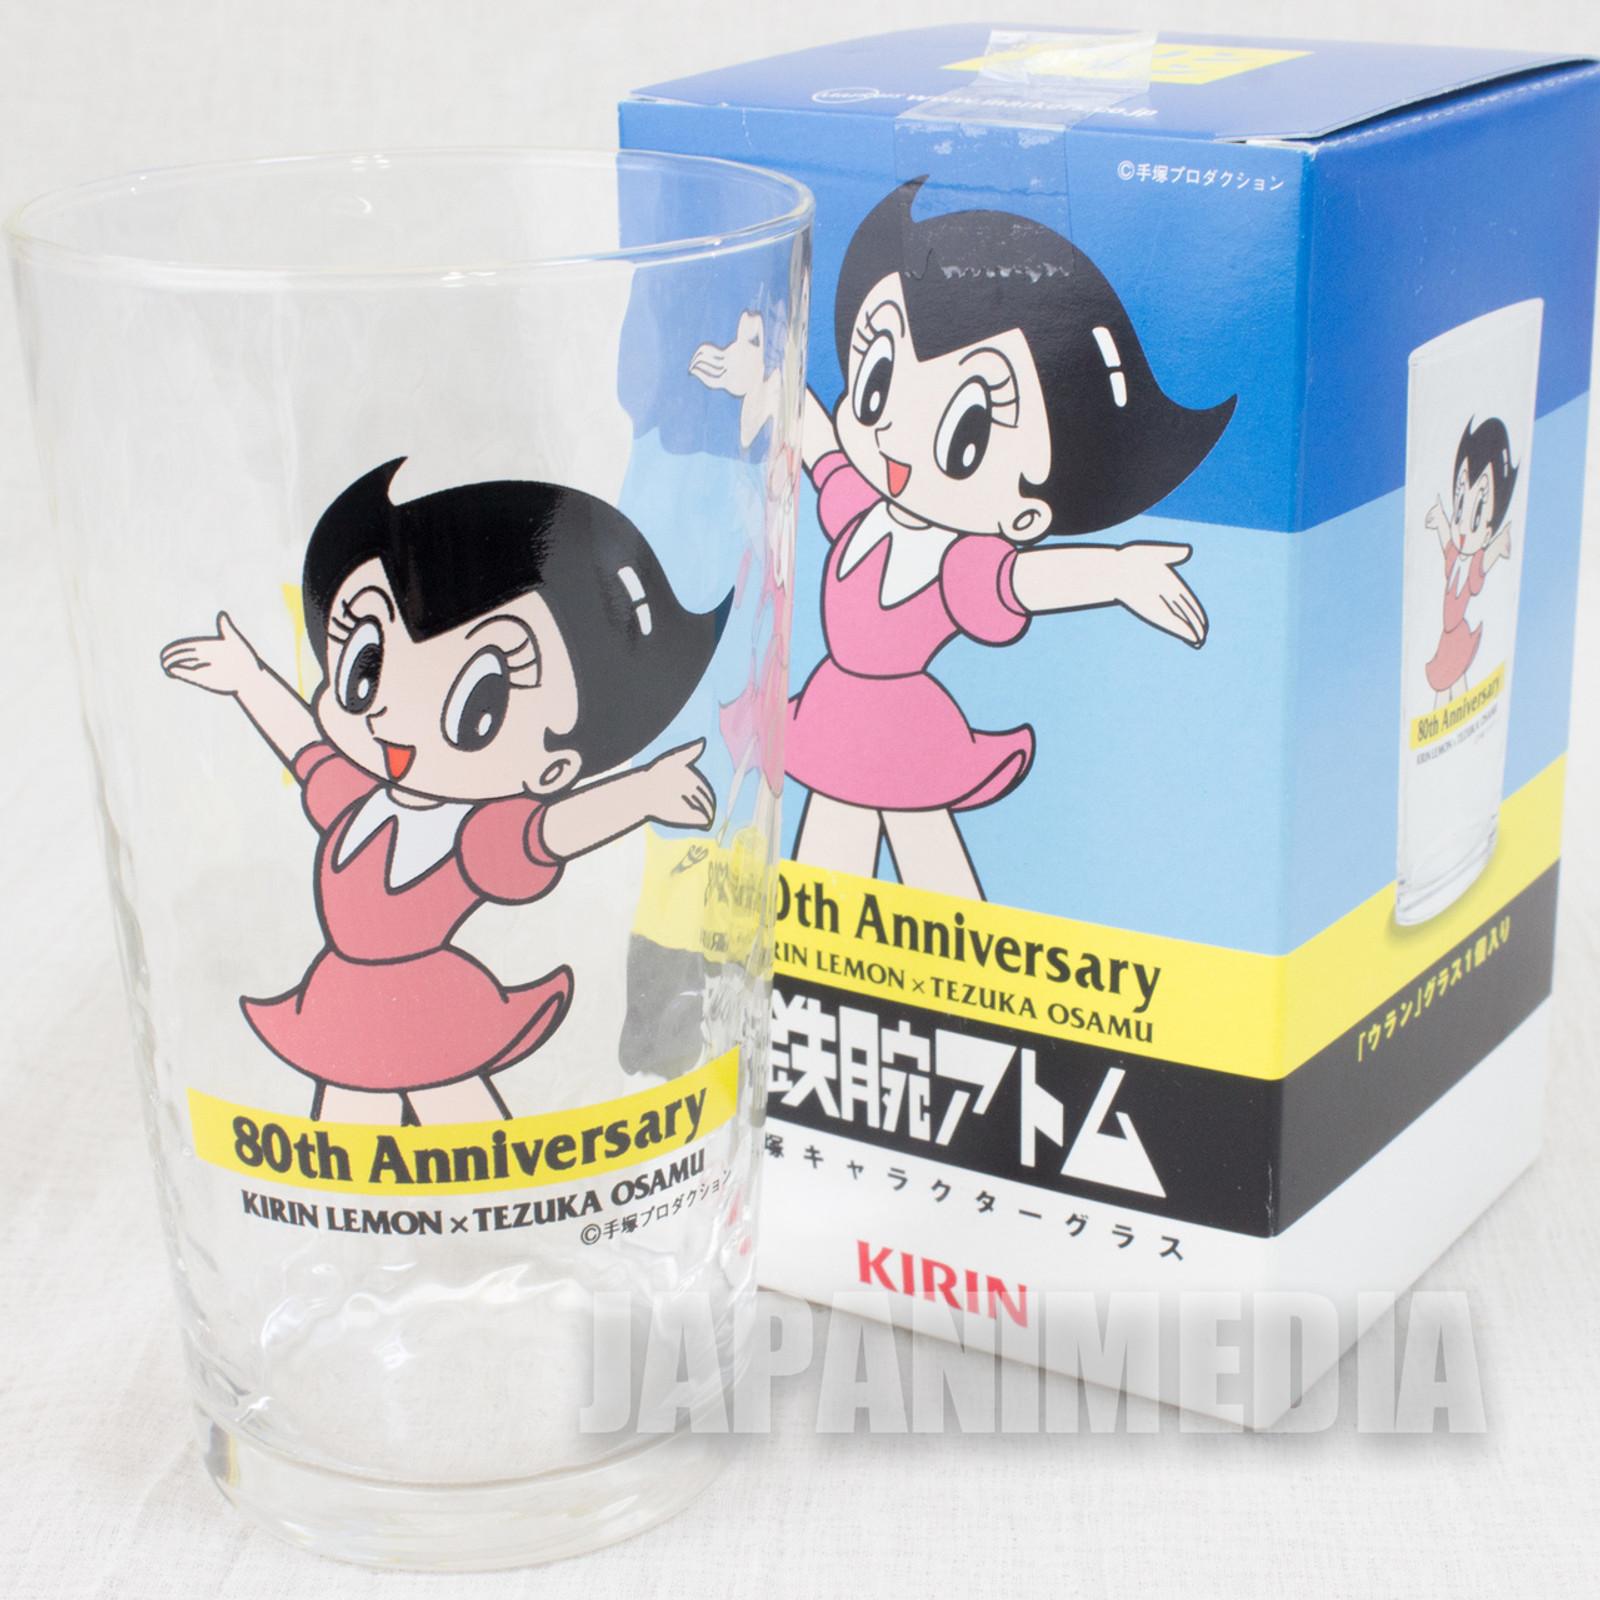 Astro Boy Uran Tezuka Osamu Glass 80th Anniversary Kirin Lemon